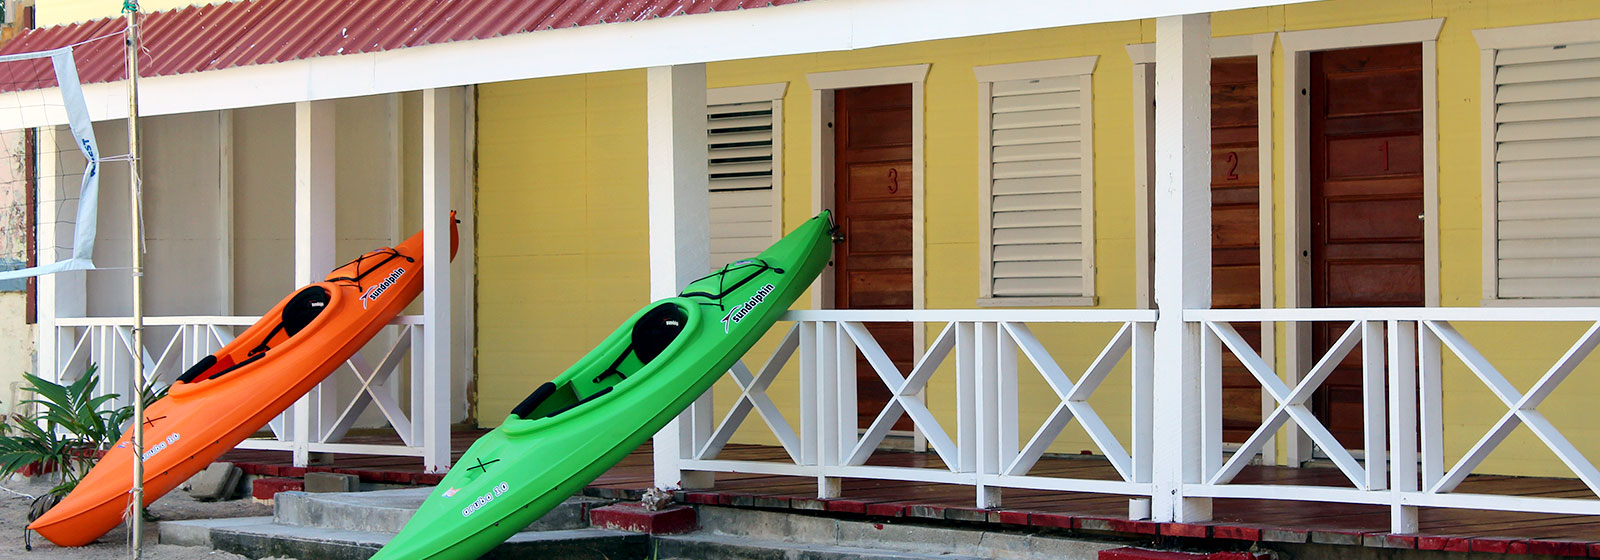 kayakingTobaccoCaye.jpg